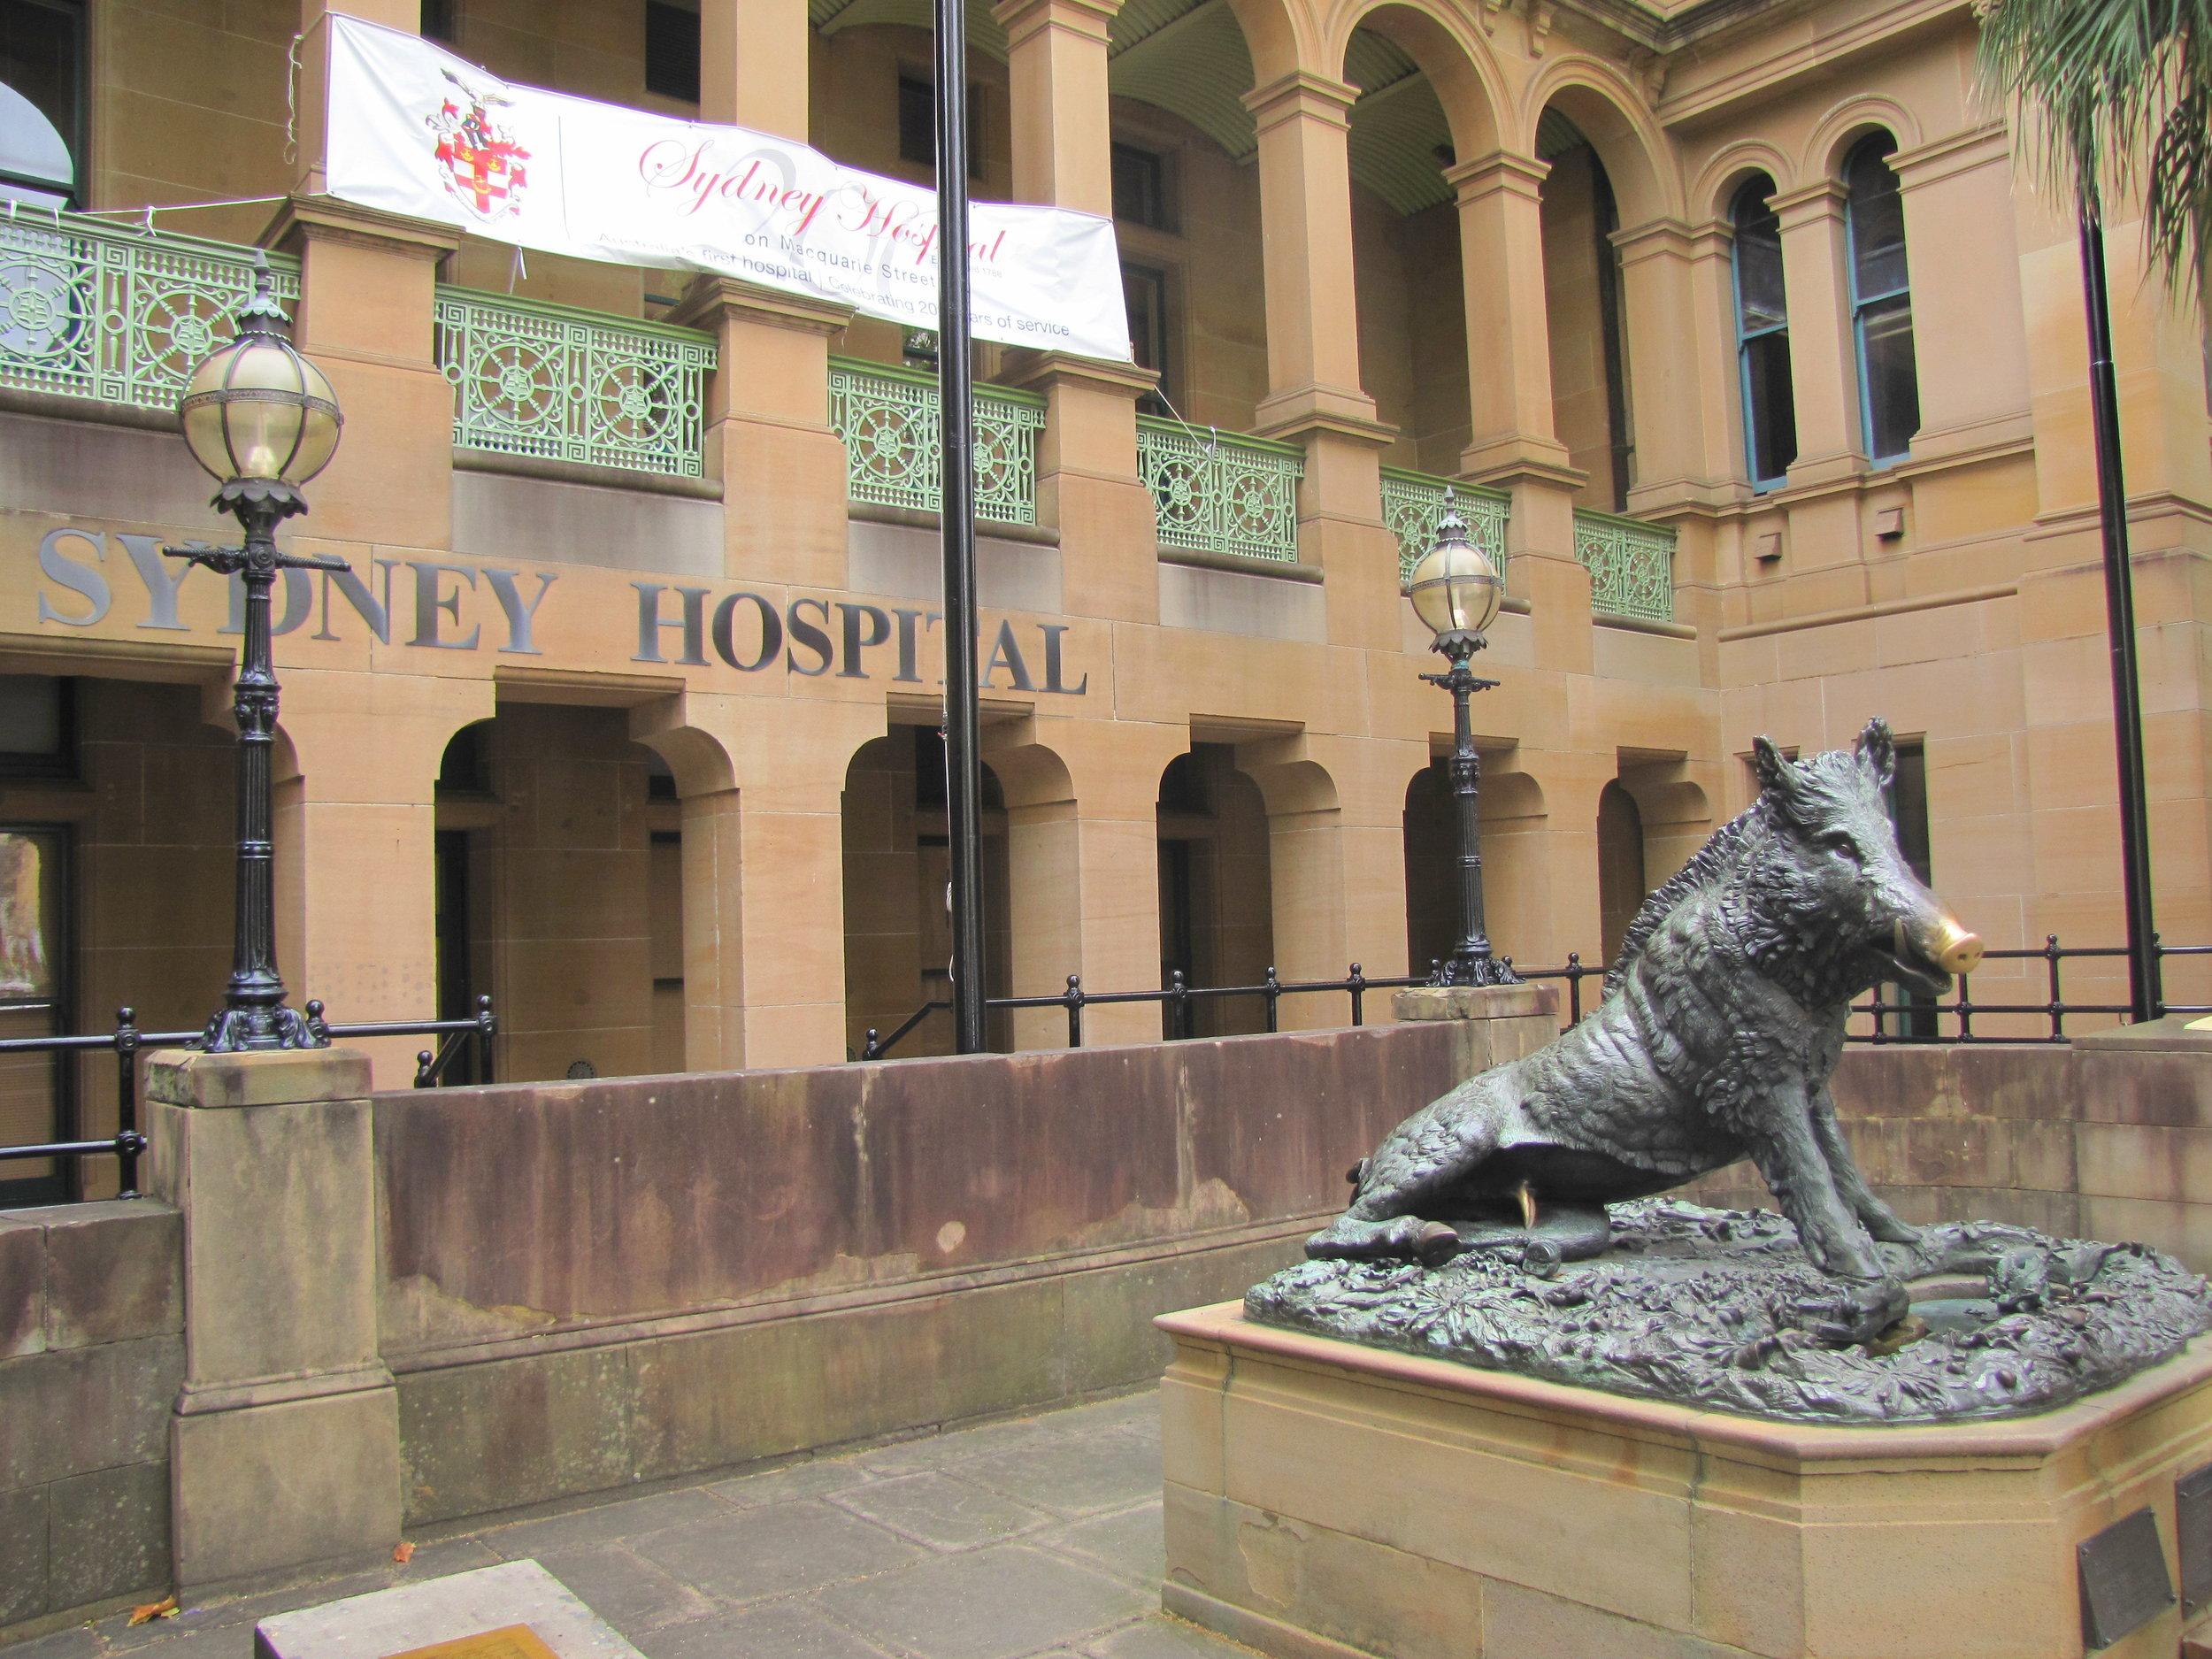 Il Porcellino, a landmark at the Sydney Hospital